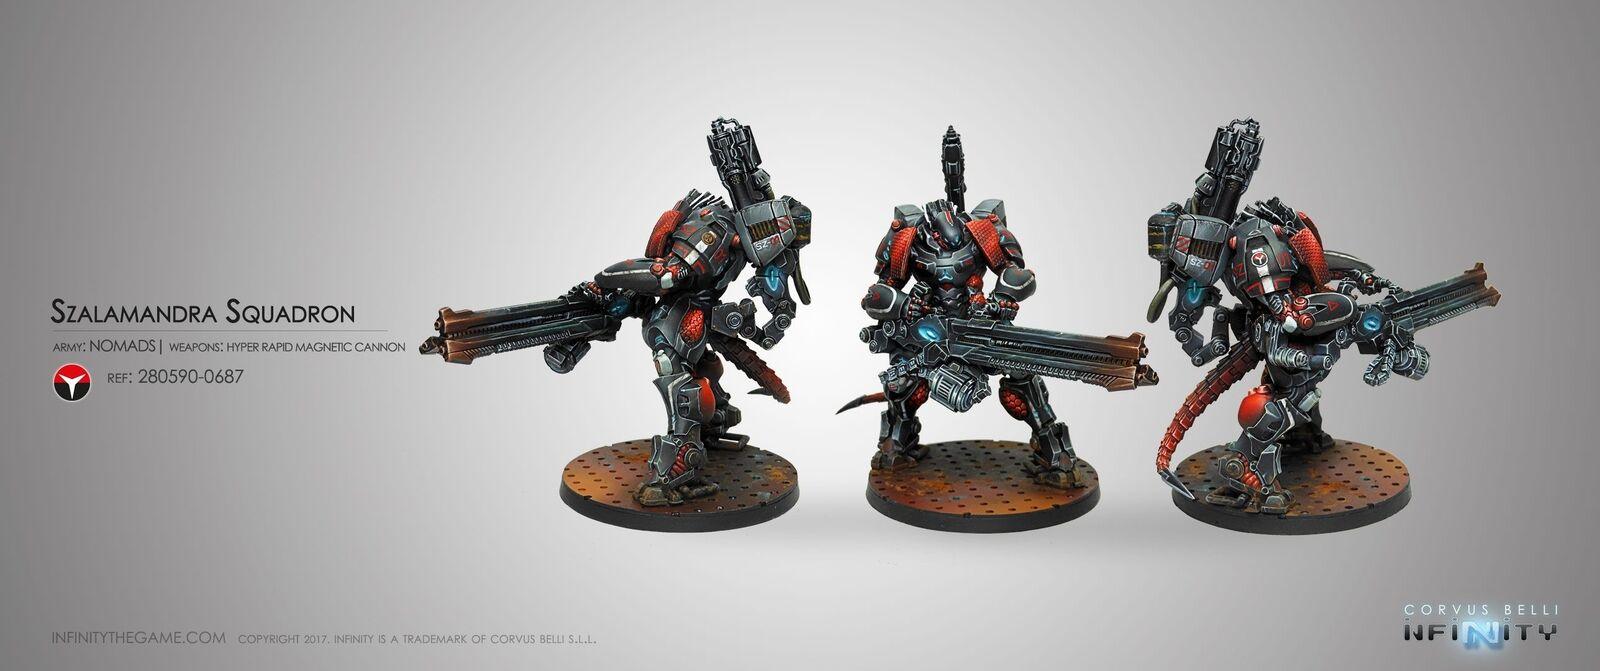 Infinity Nomads Szalamandra Squadron Corvus Belli Inf 280590 Tag T. A.G